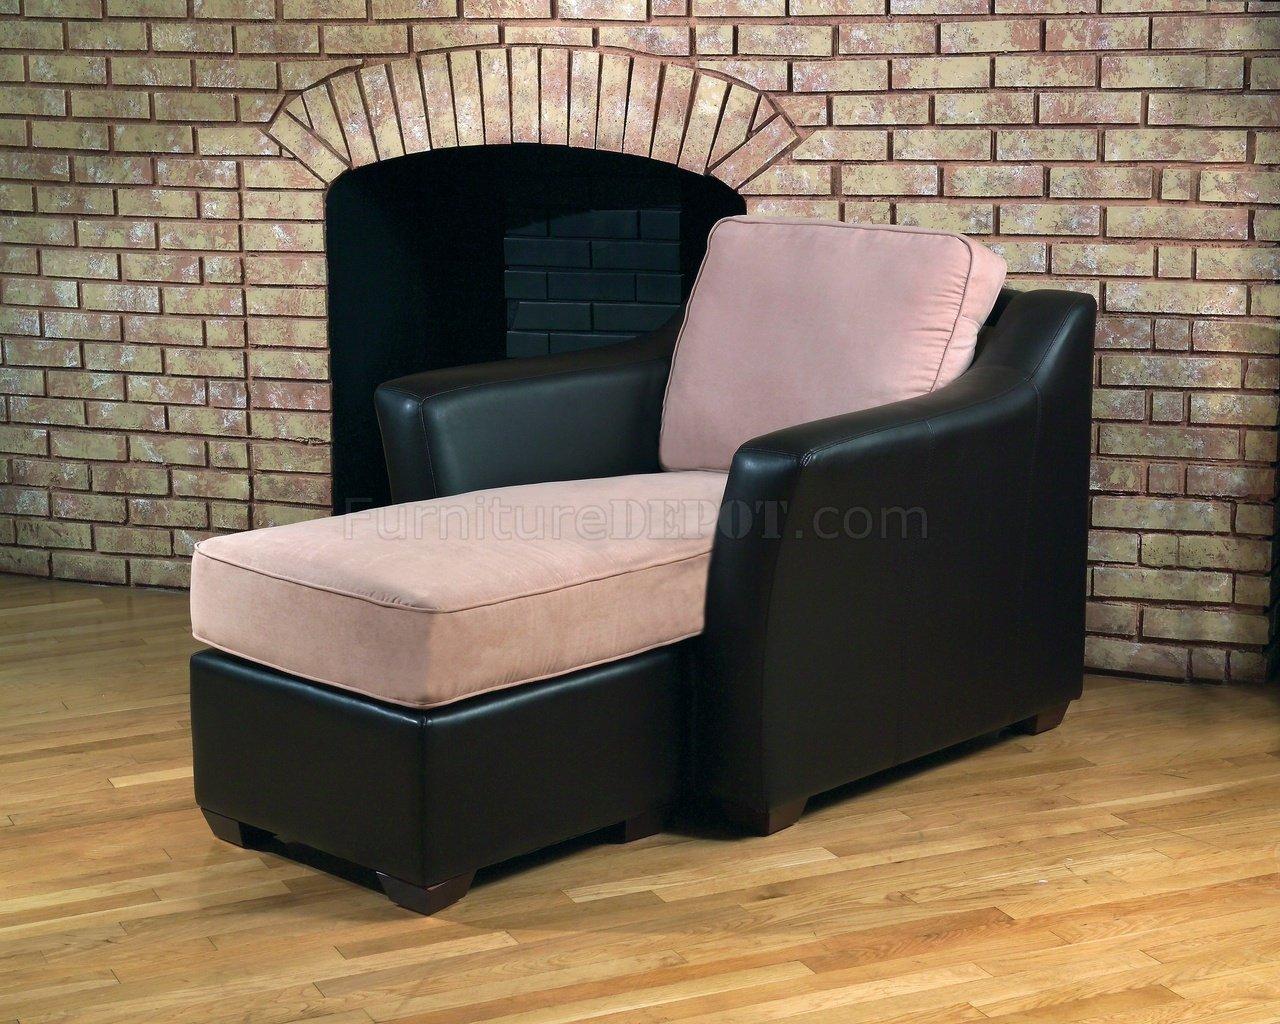 cream colored microfiber sofa furniture in dubai two tone and pu modern reversible w